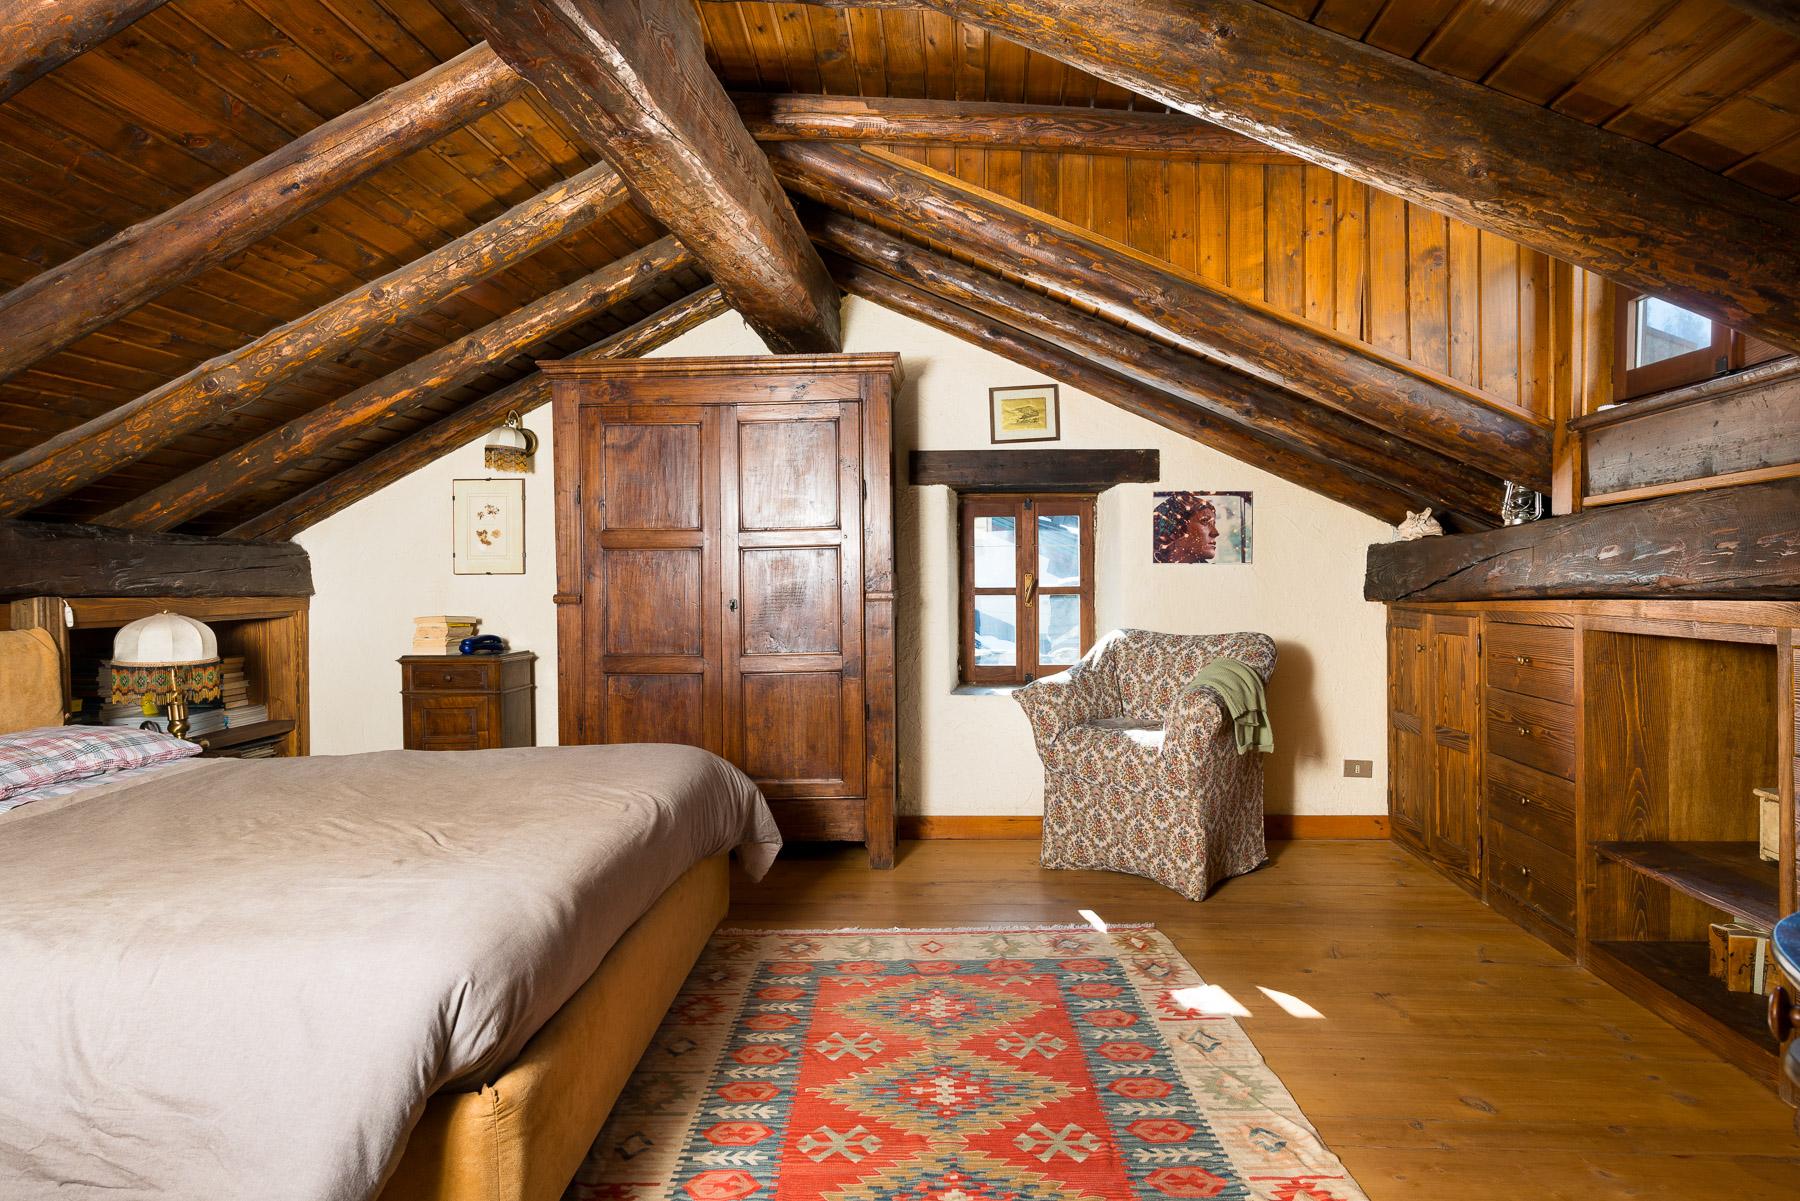 Casa indipendente di lusso in vendita a courmayeur via for Vendita case lusso